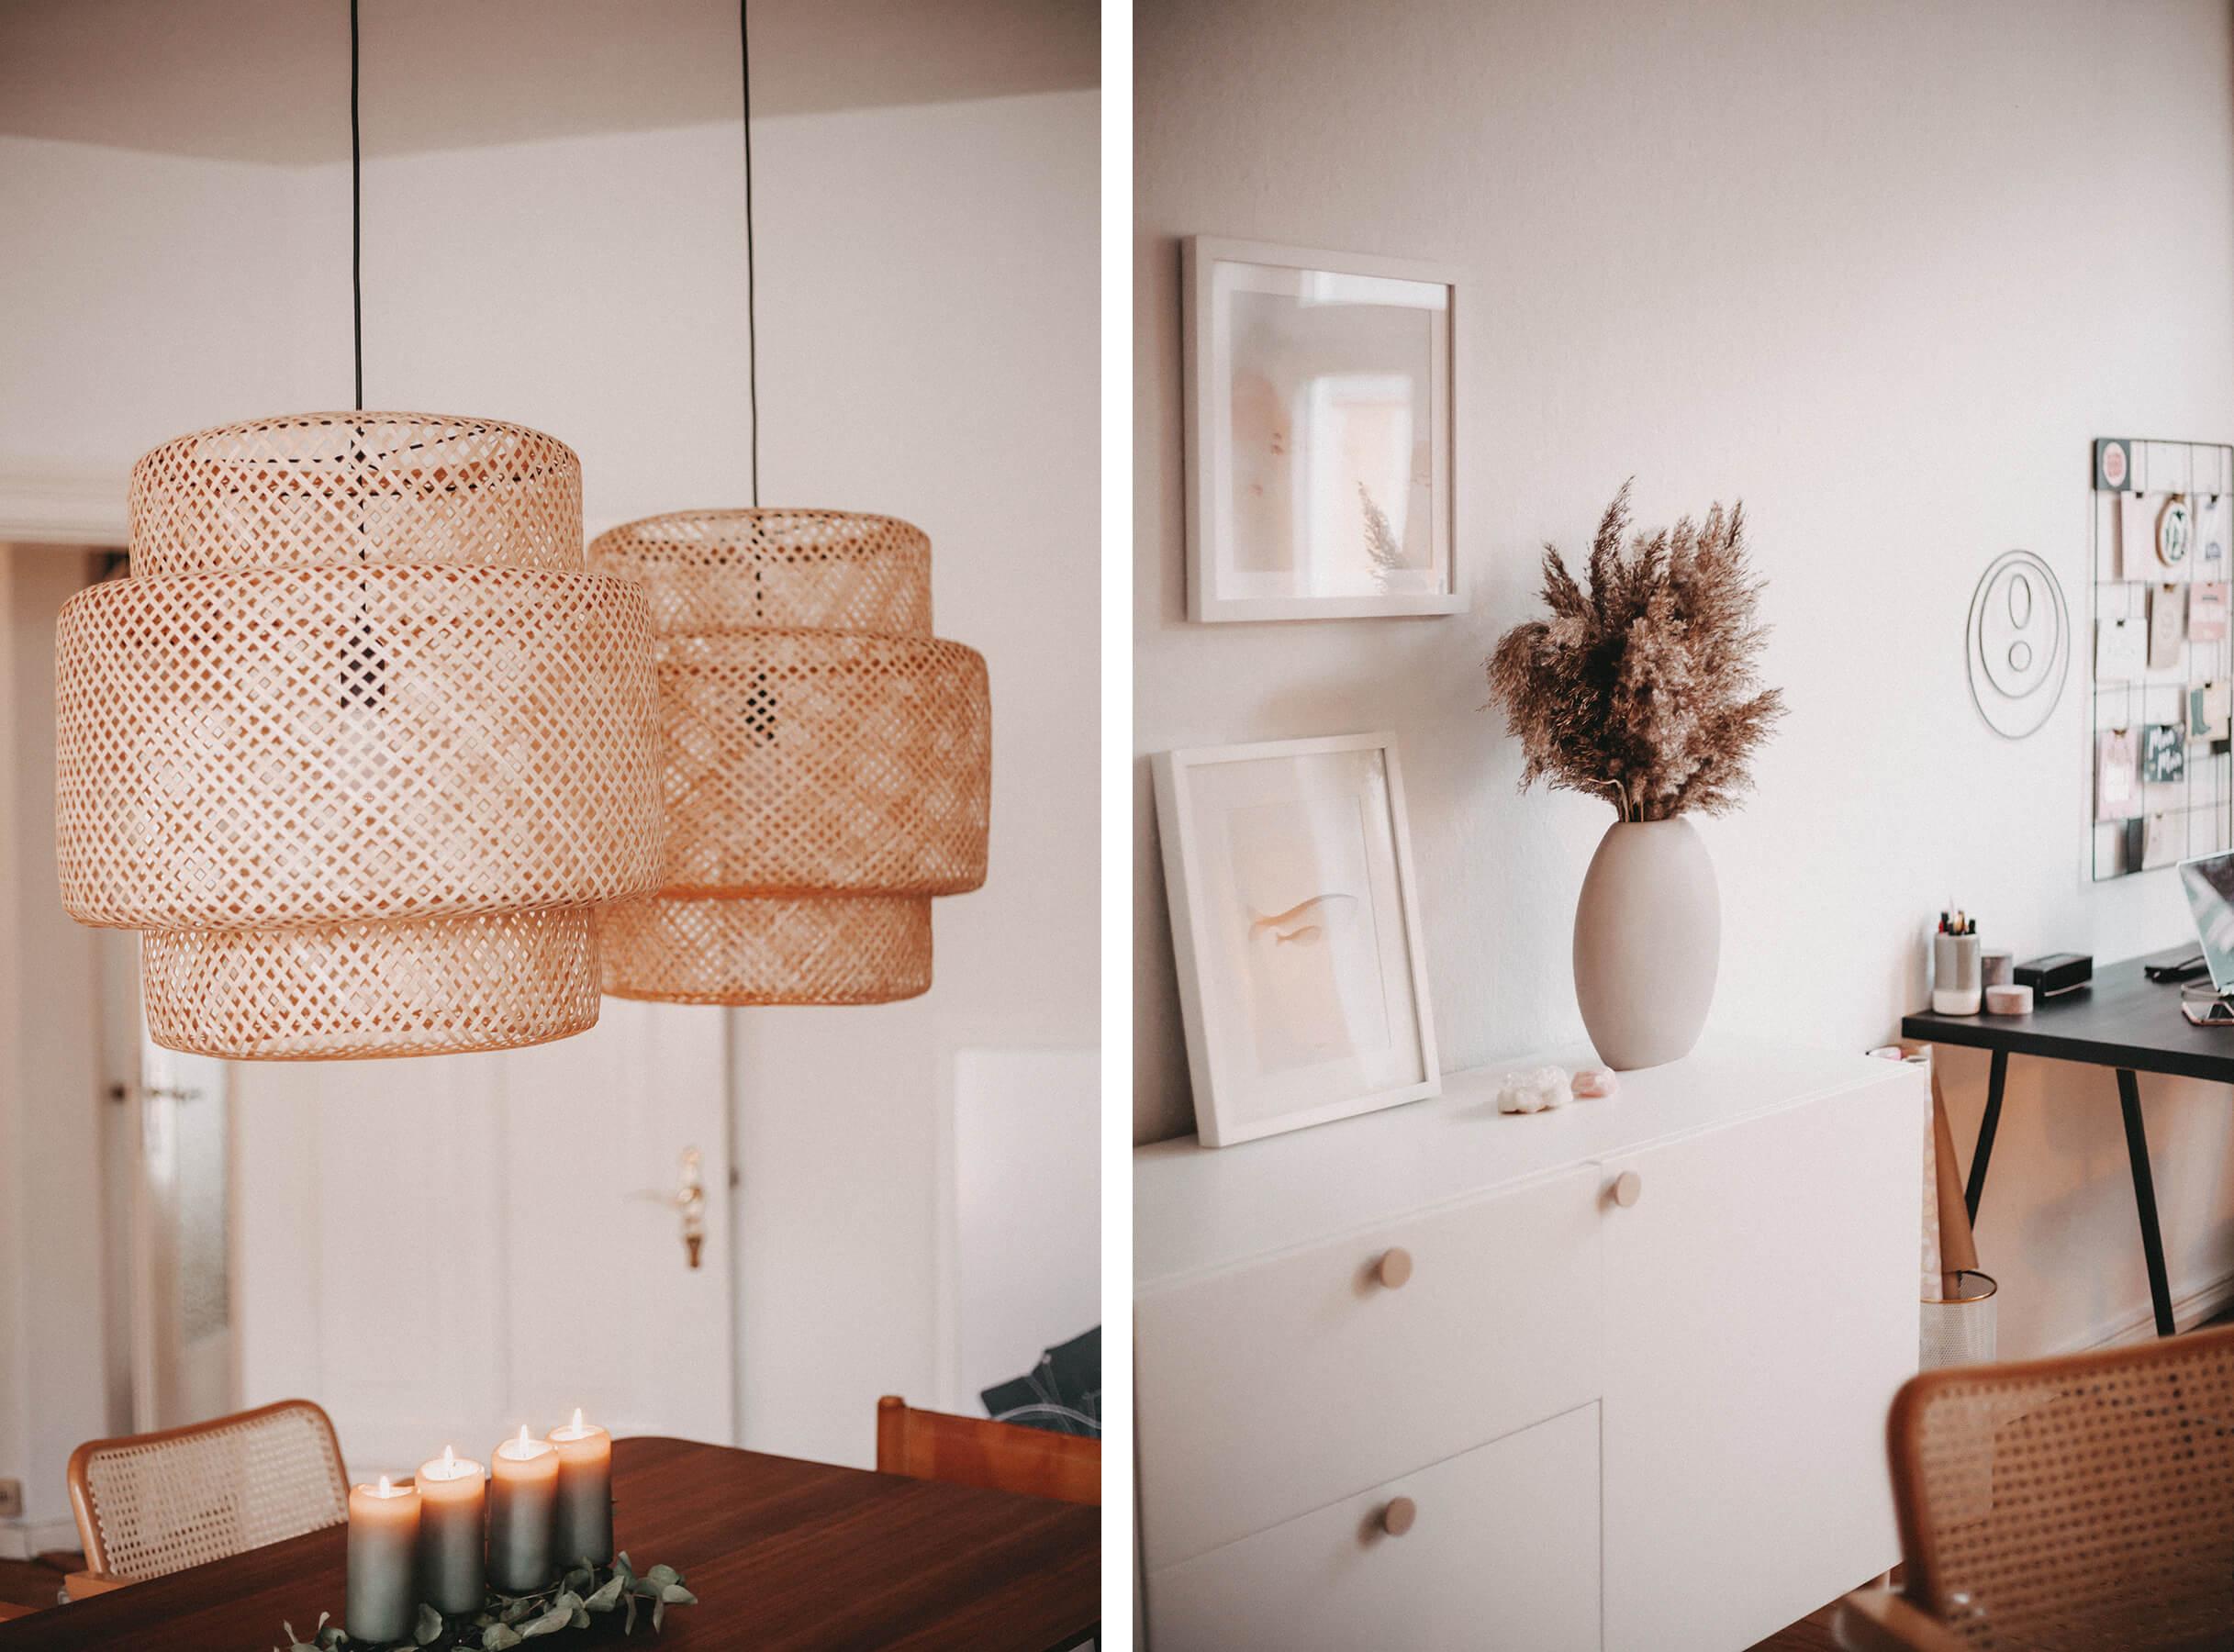 Nina von @nina_ninosy, Detailaufnahme: Korblampen, Vase